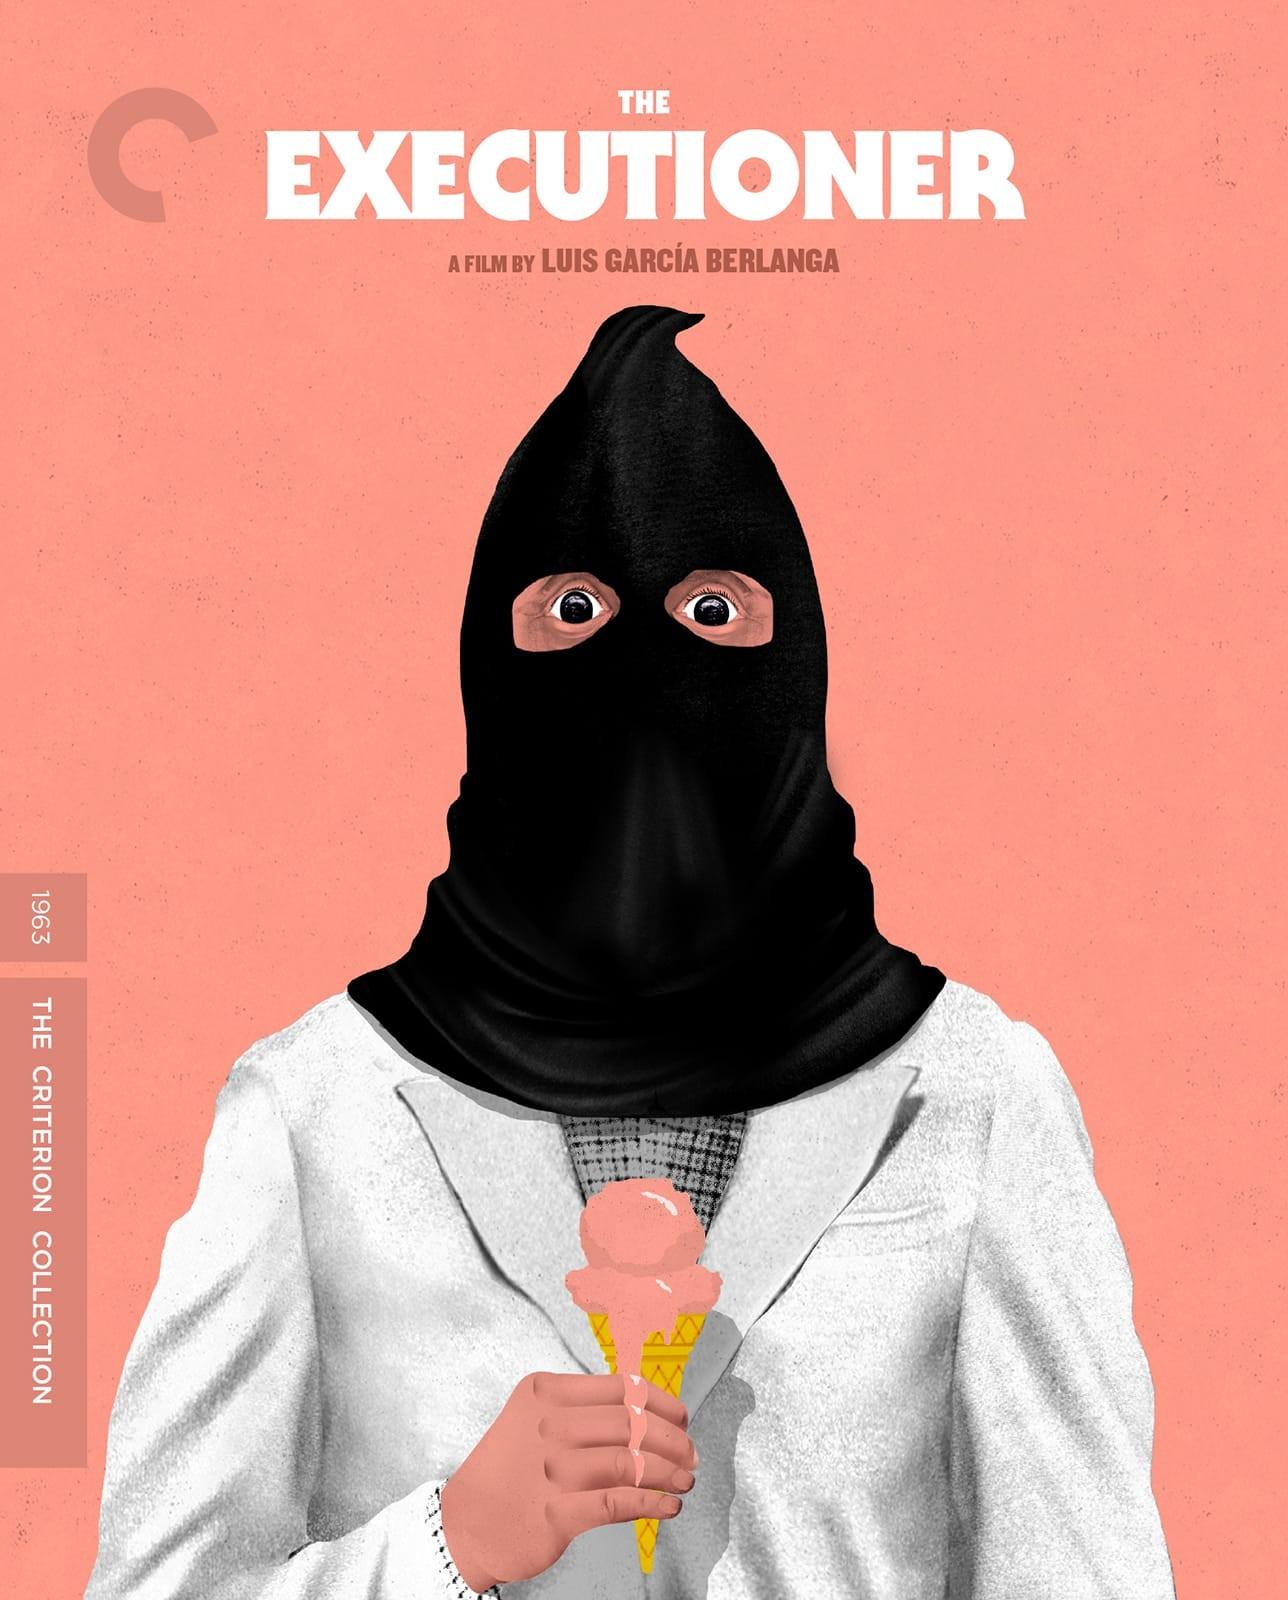 executioner definition short